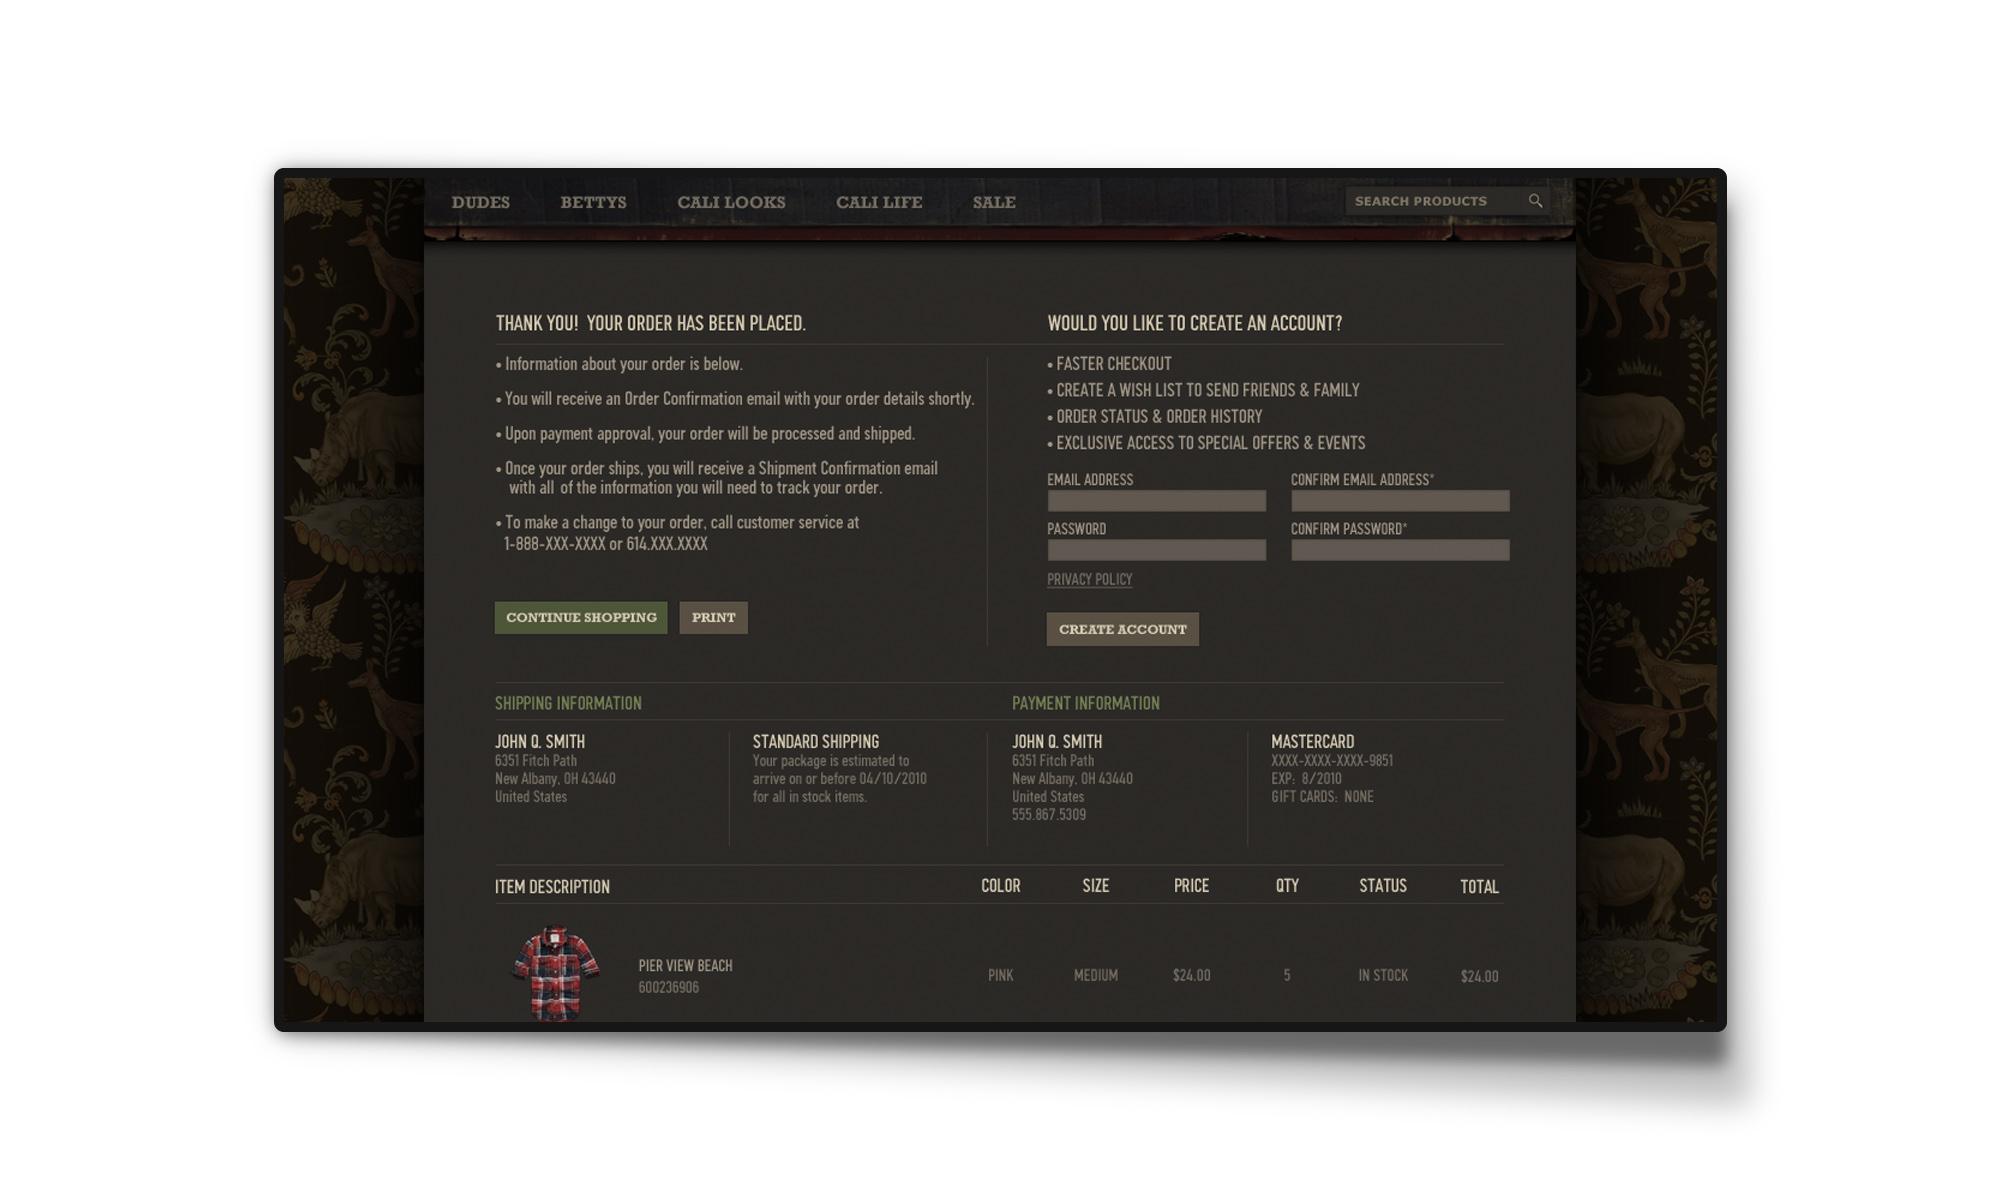 hco-redesign-checkout-desktop.jpg